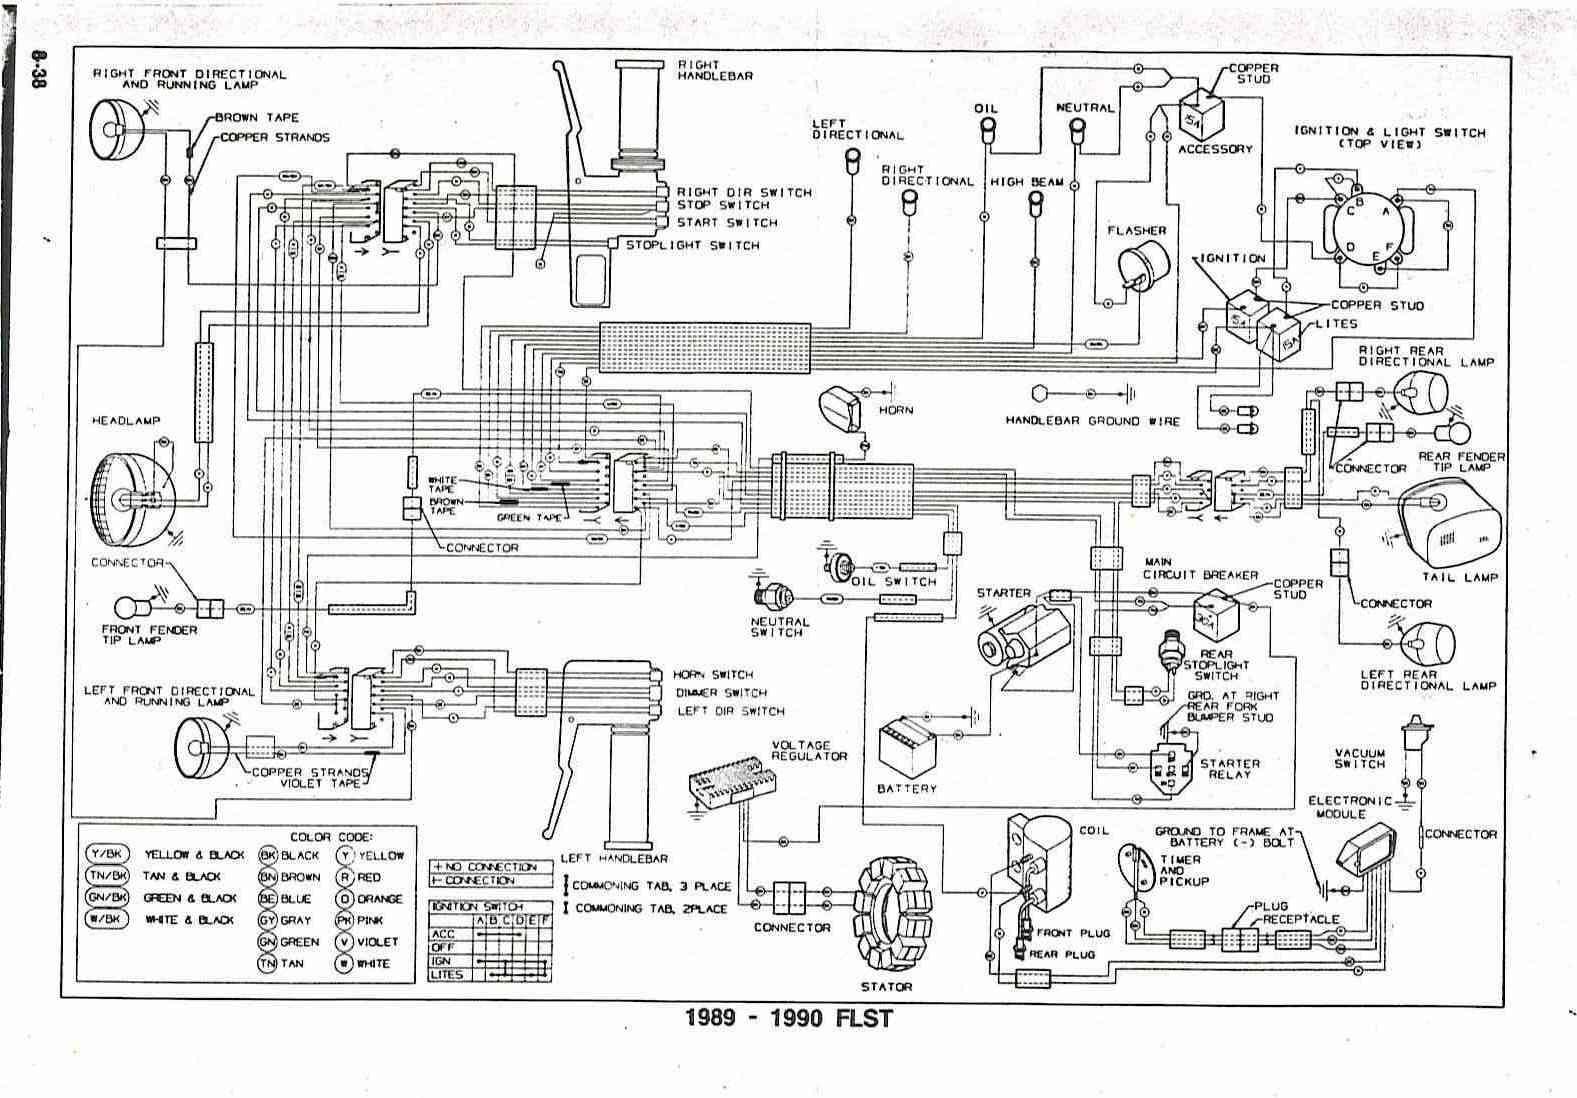 1990 Harley Davidson Wiring Diagram | Wiring Library - Harley Davidson Wiring Diagram Manual